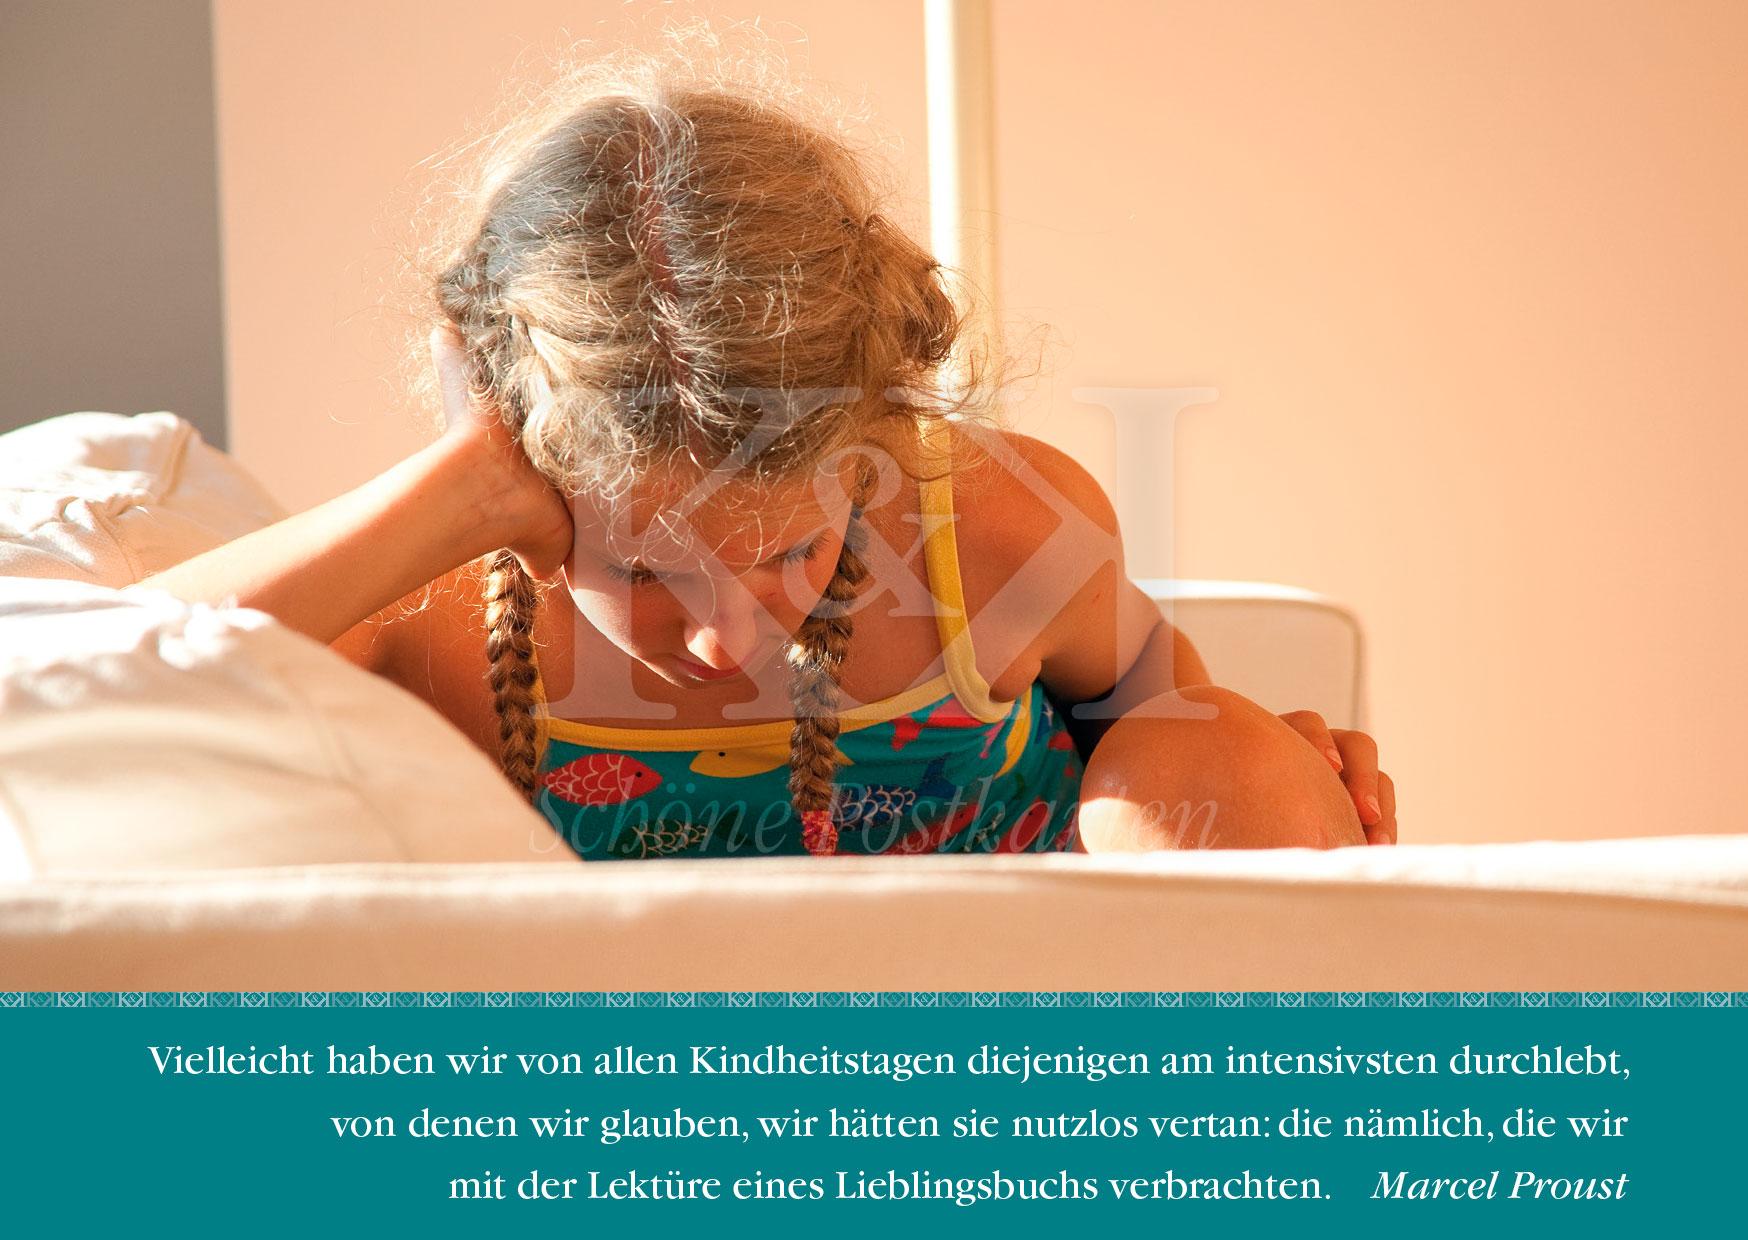 Schöne Postkarte Nr. 74 · Proust: Lektüre eines Lieblingsbuchs © www.schoeneposkarten.de